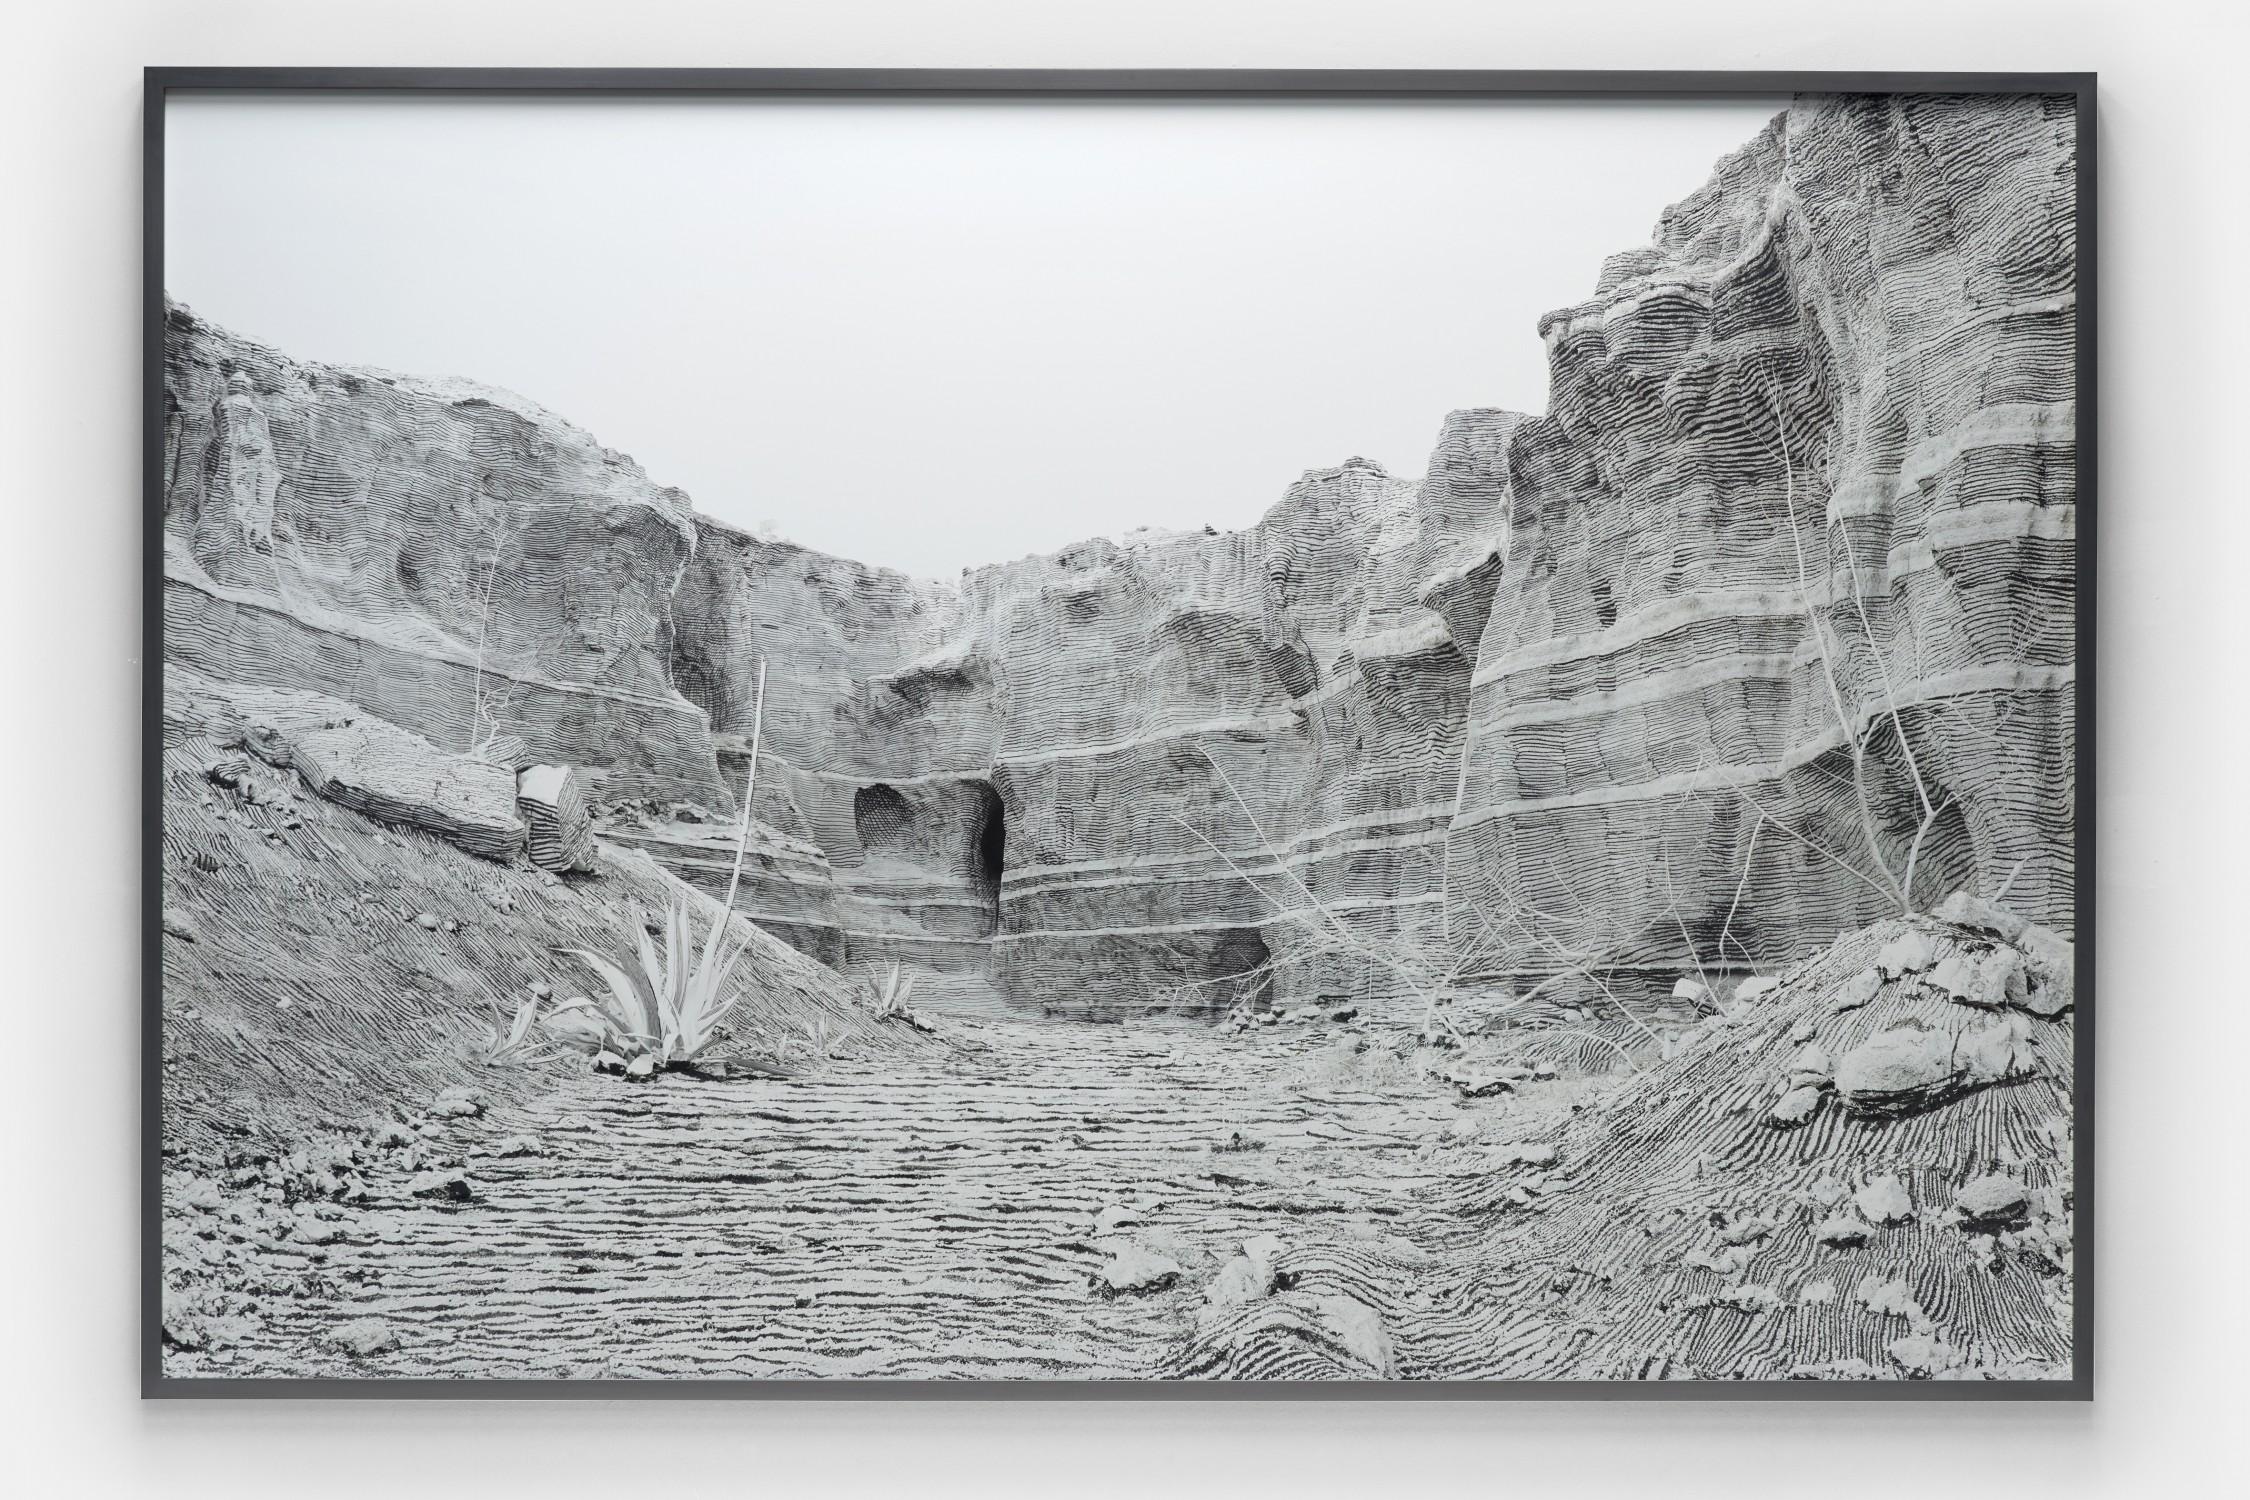 Landscape Painting Quarry (Day)